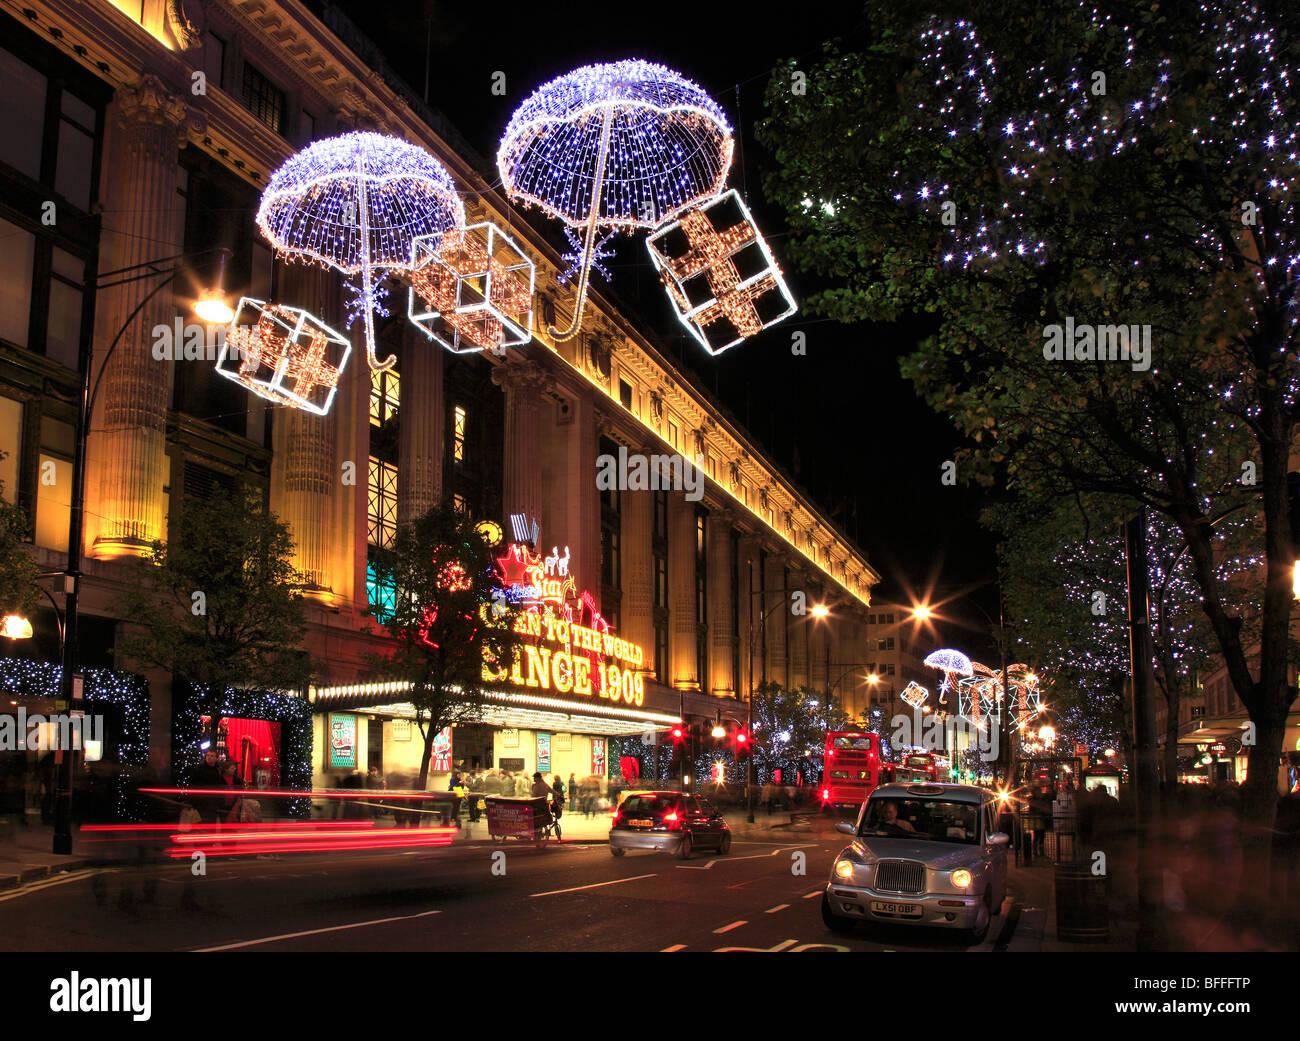 Selfridges store at Xmas in Oxford Street London UK - Stock Image